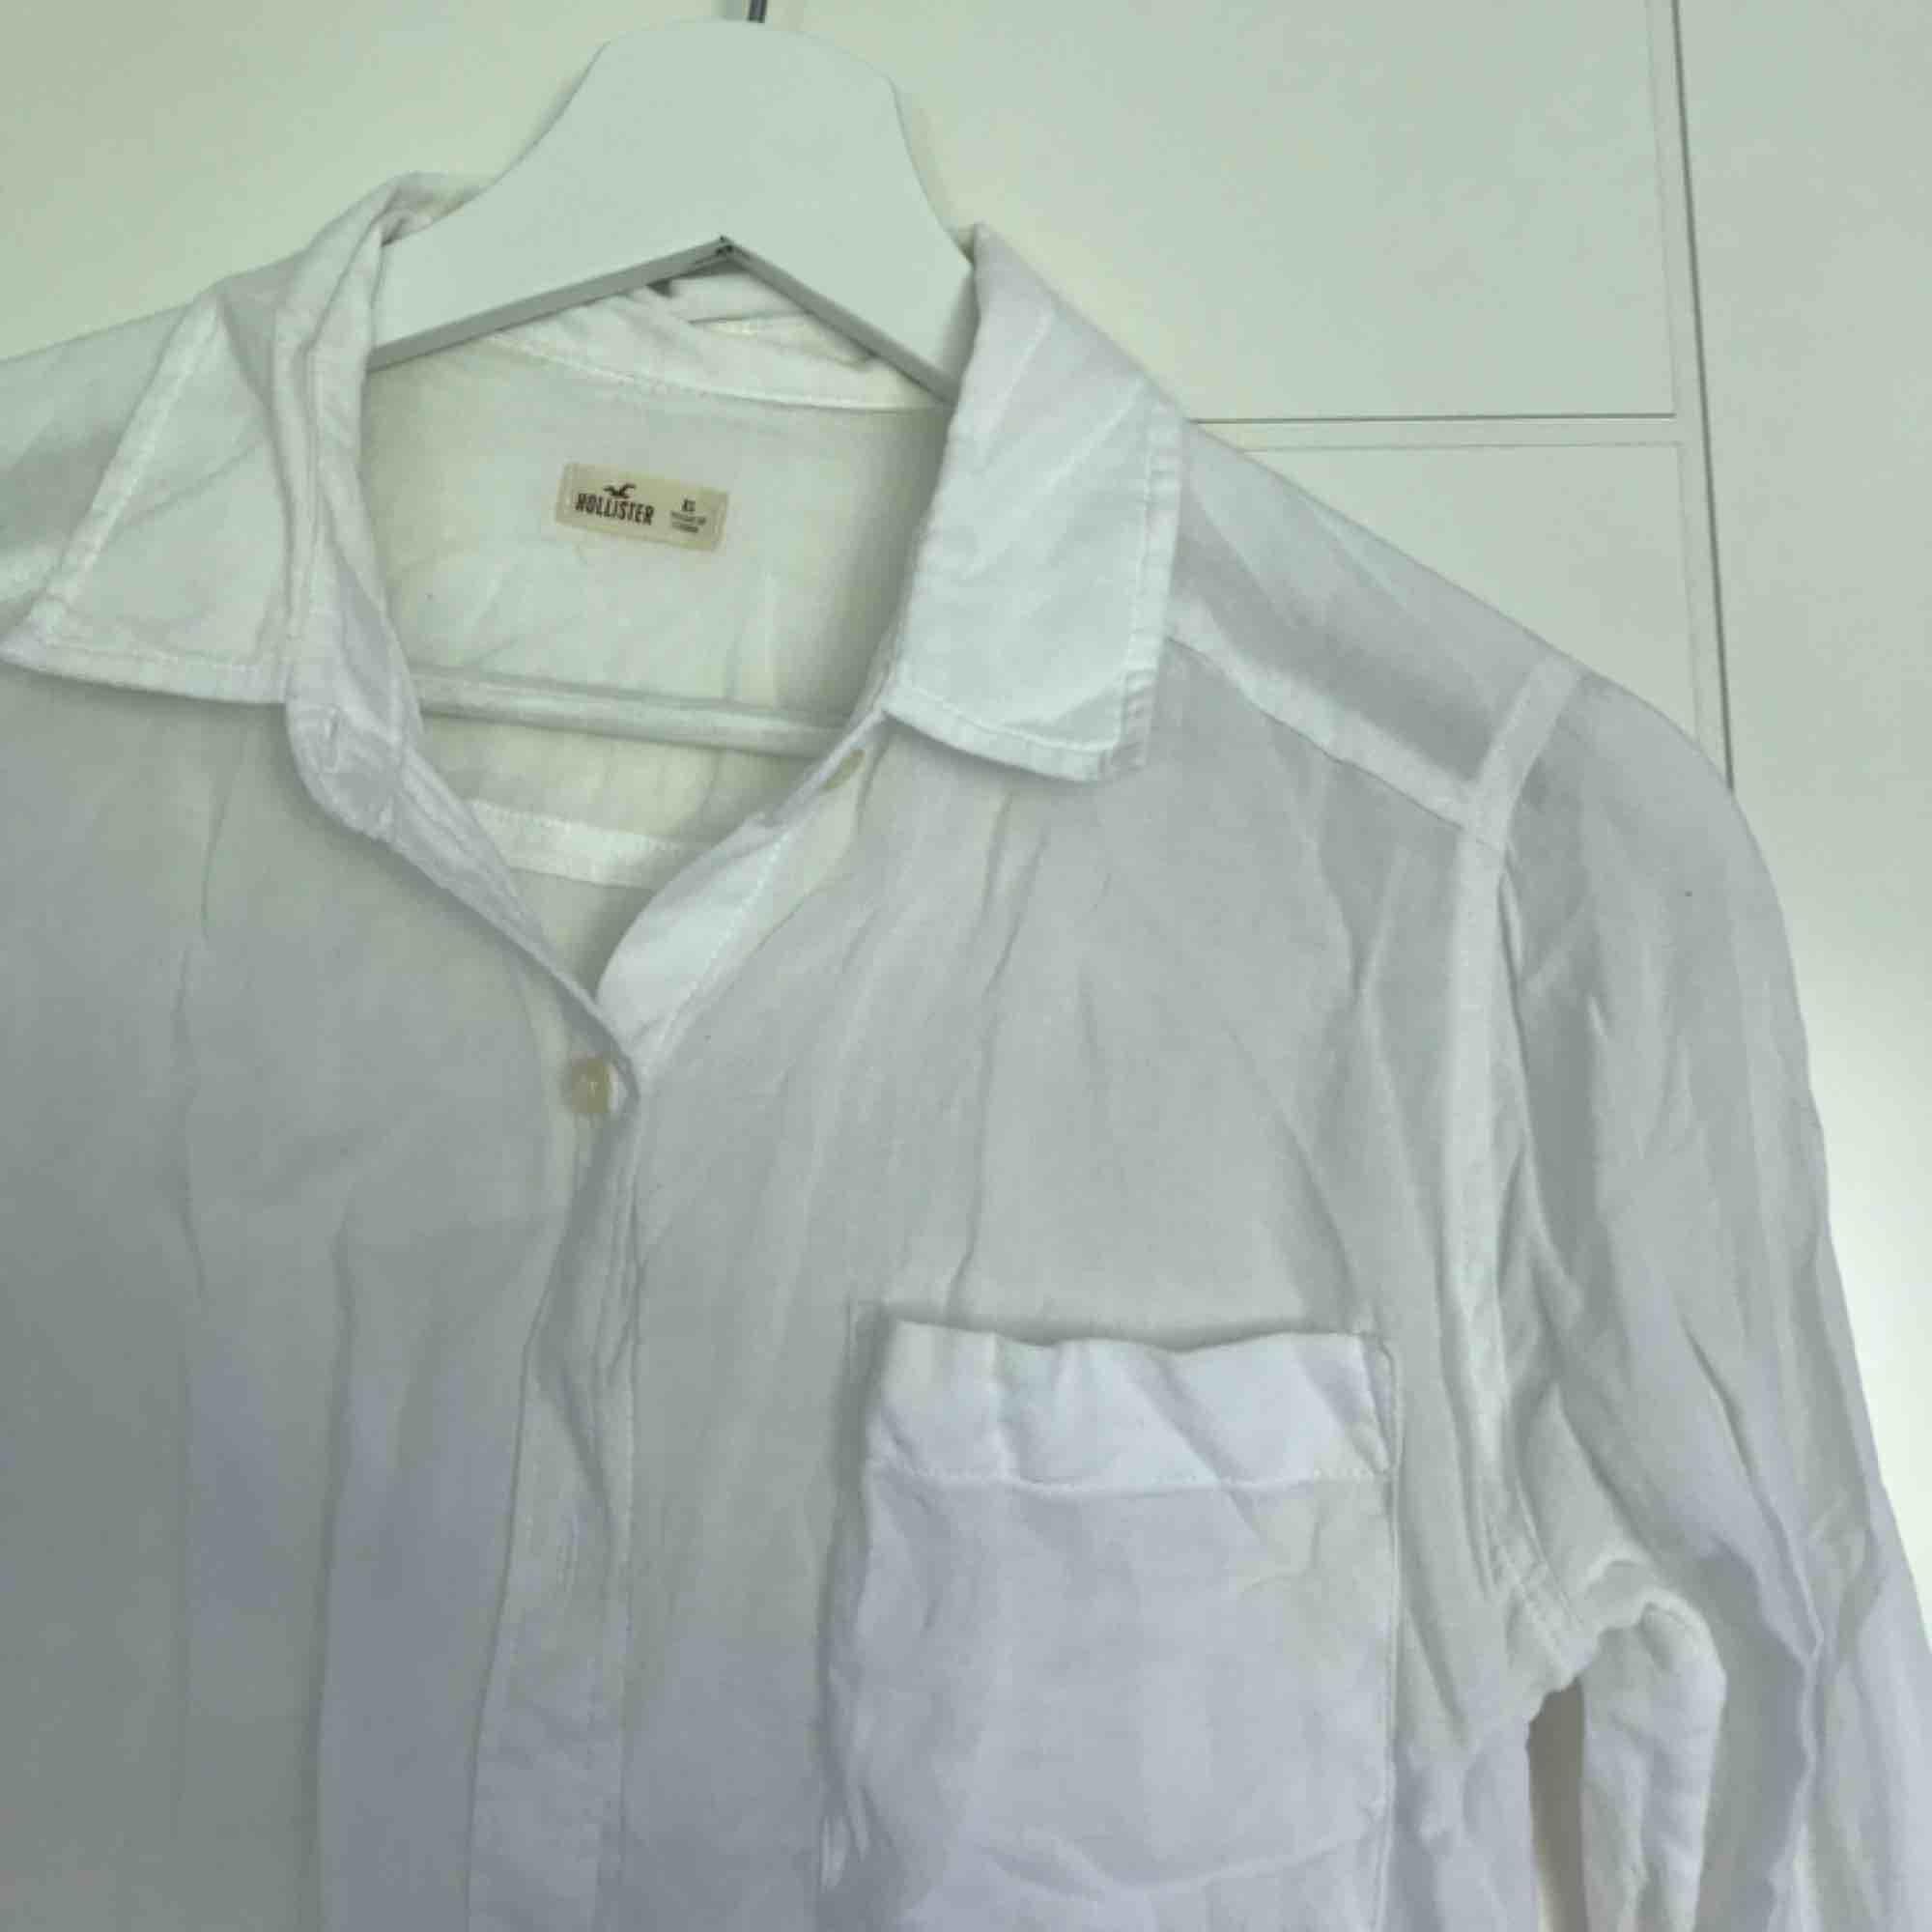 Vit linne-skjorta från Hollister. Passar XS/S. . Skjortor.